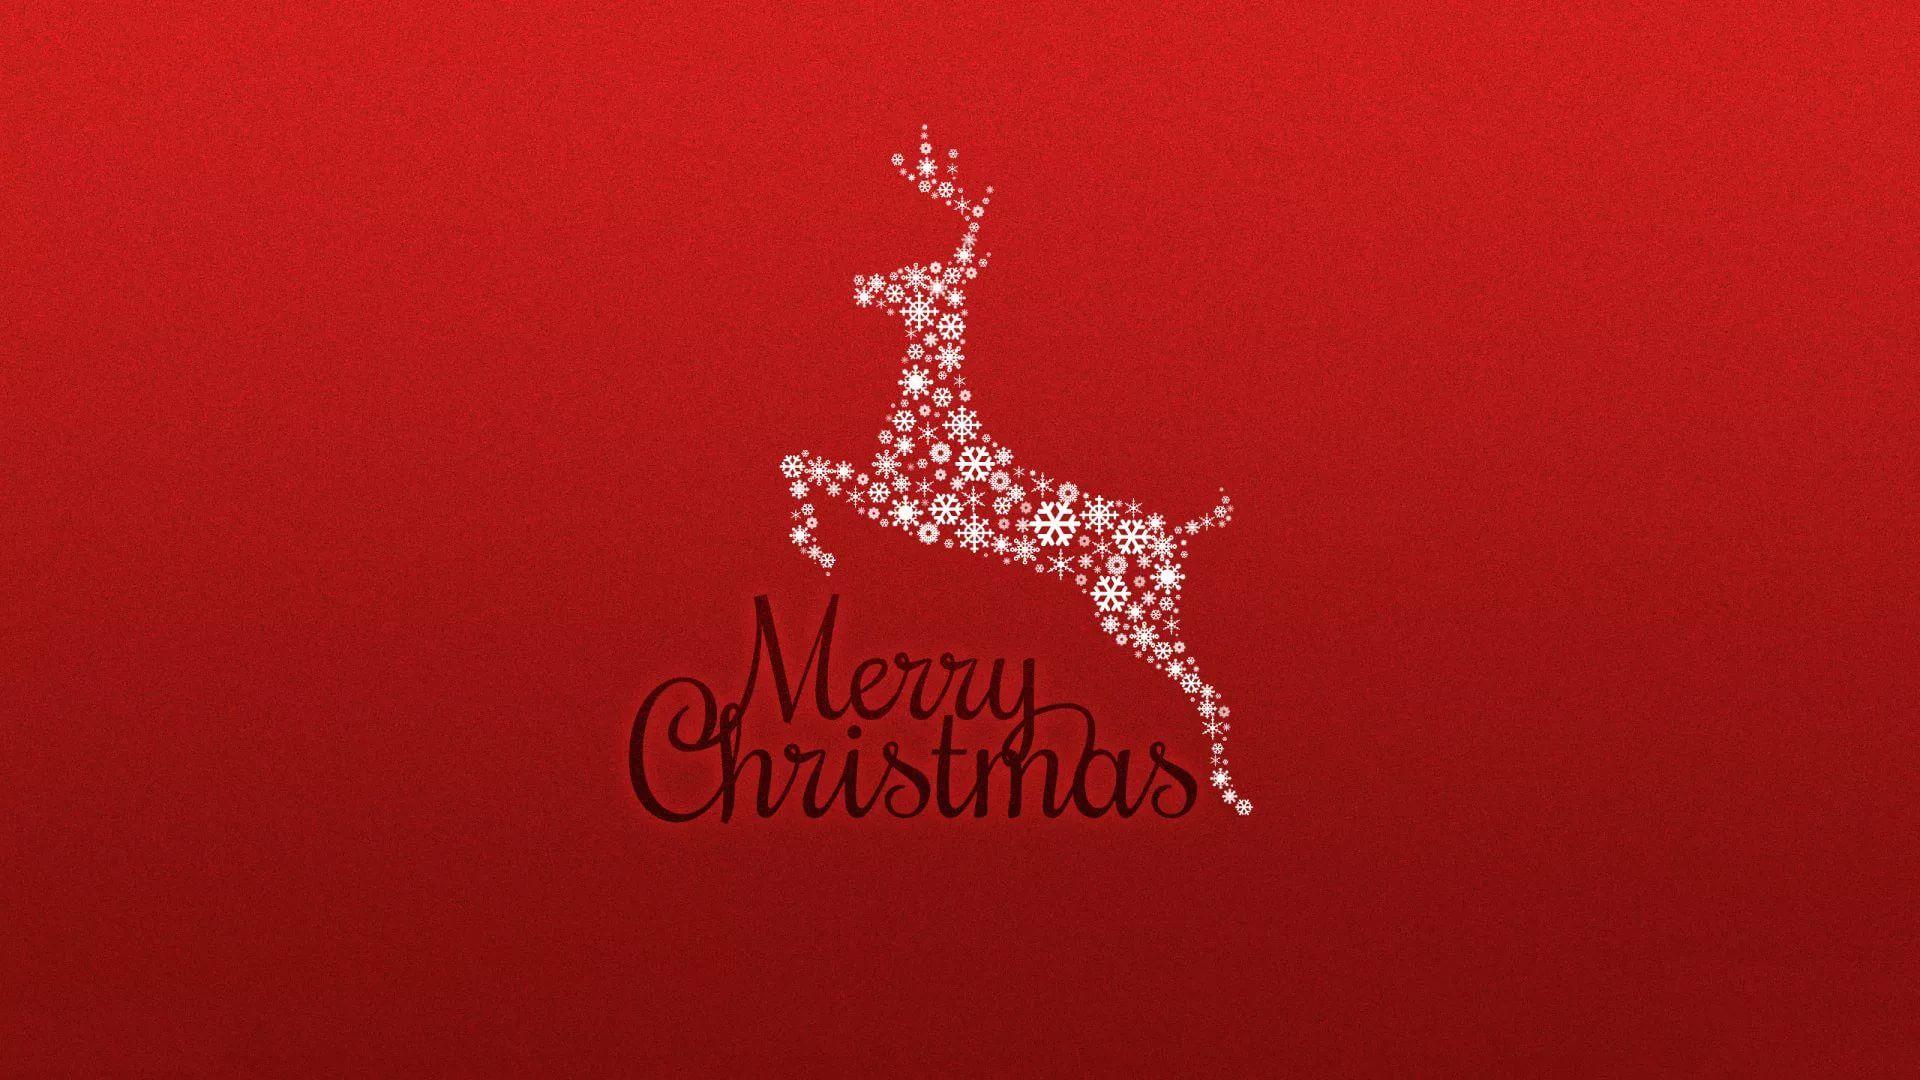 Merry Christmas 1080p Wallpaper